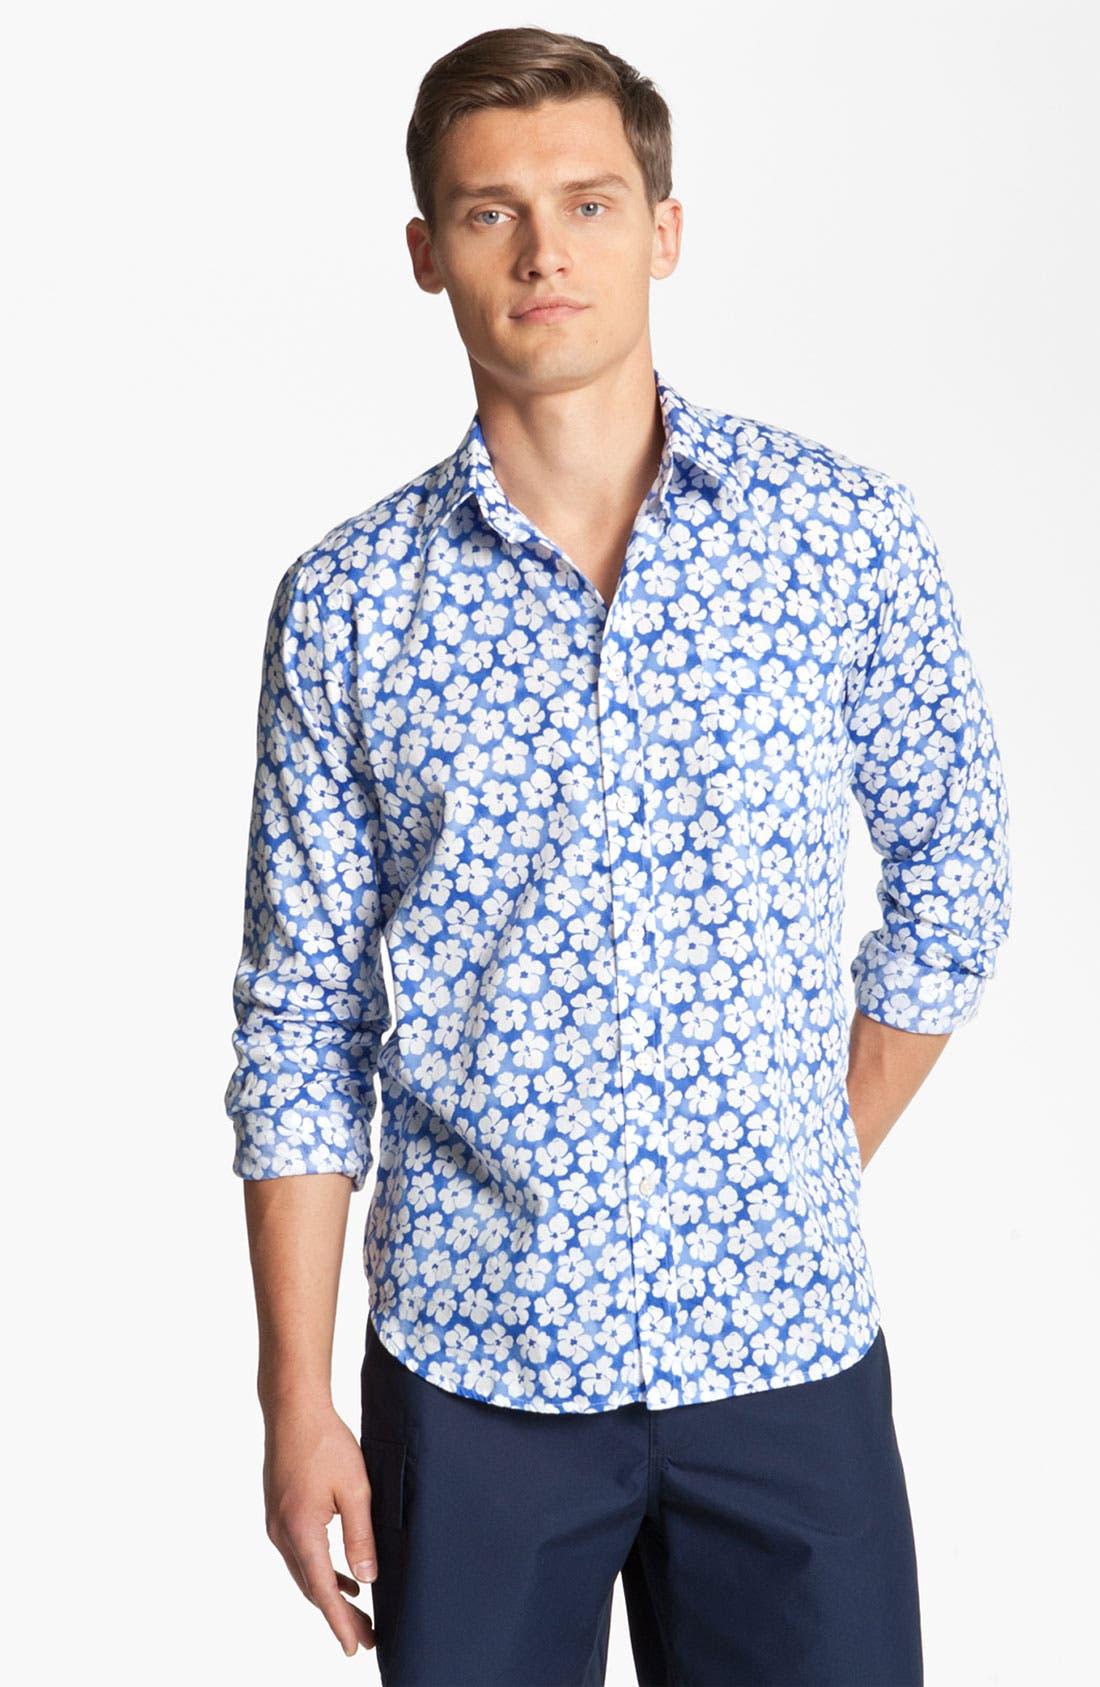 Alternate Image 1 Selected - Vilebrequin Print Cotton Sport Shirt